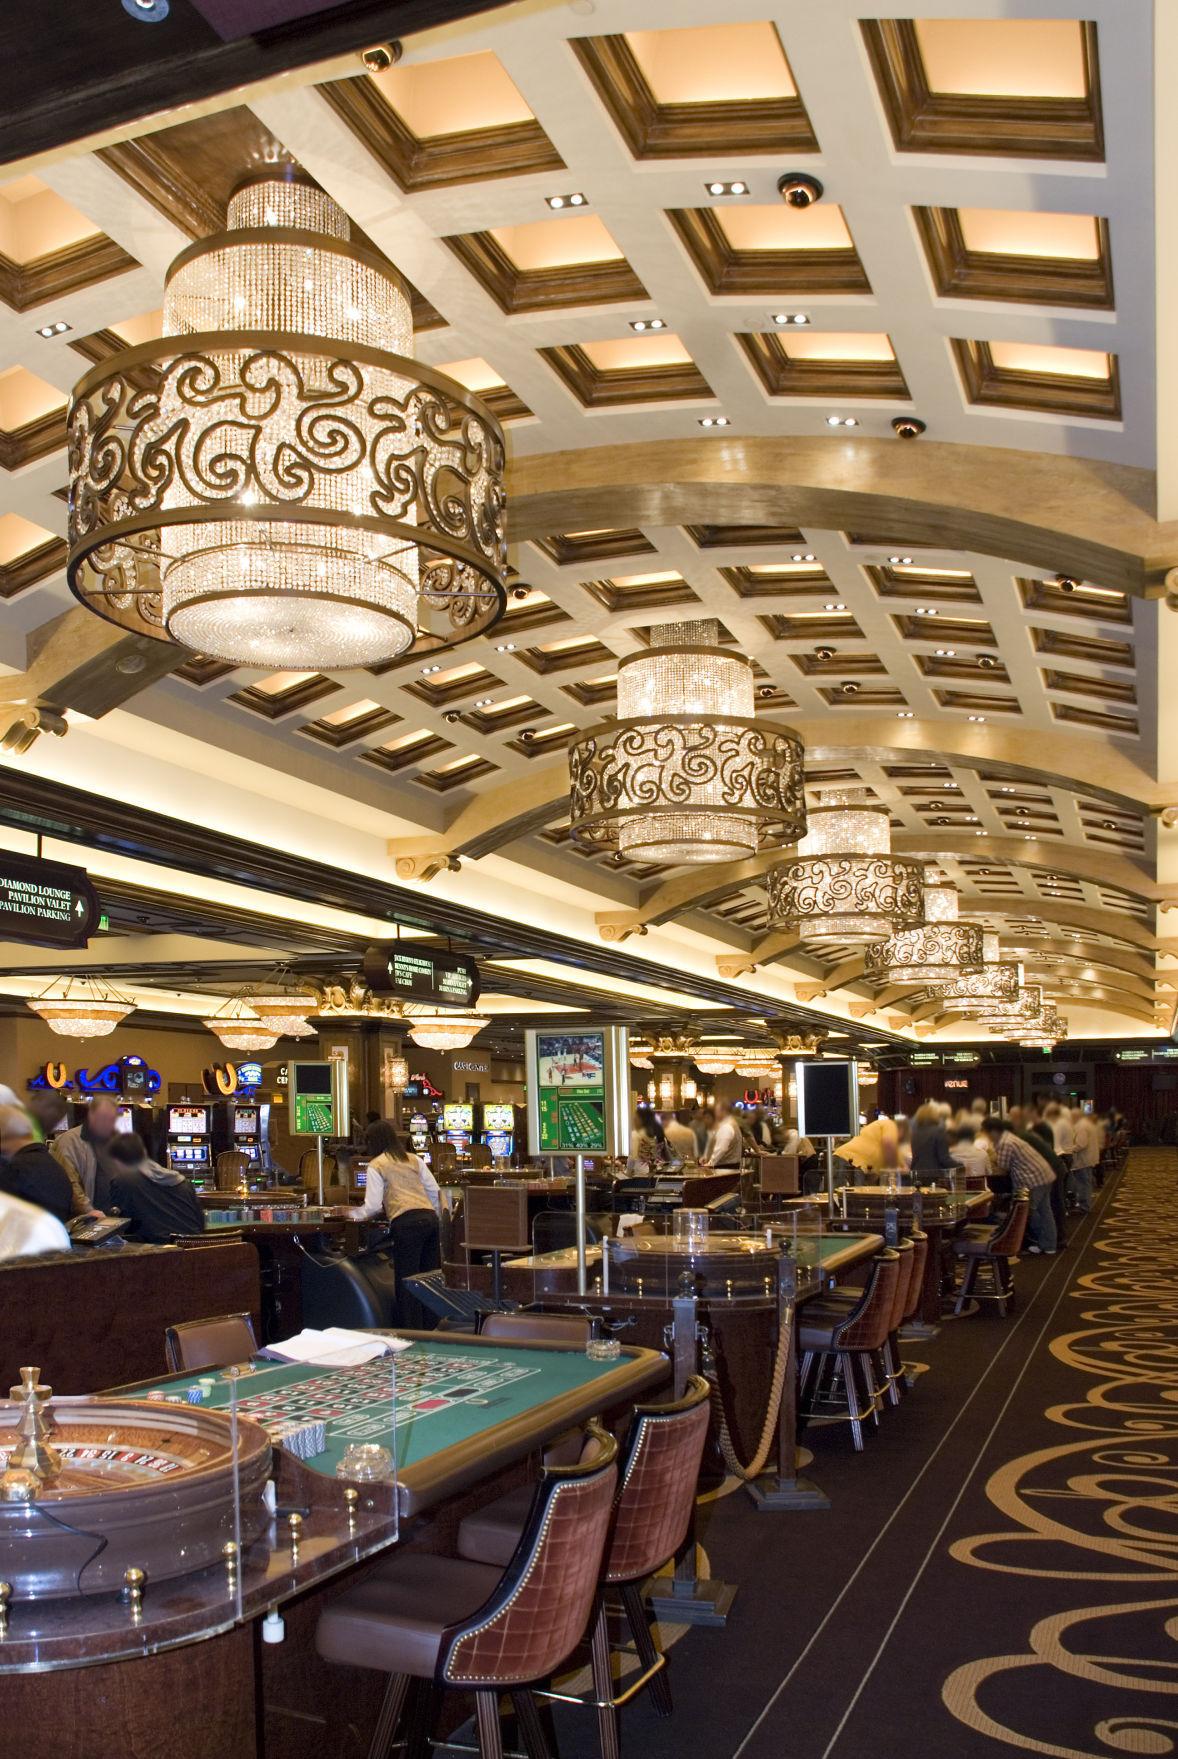 Gambling in indiana